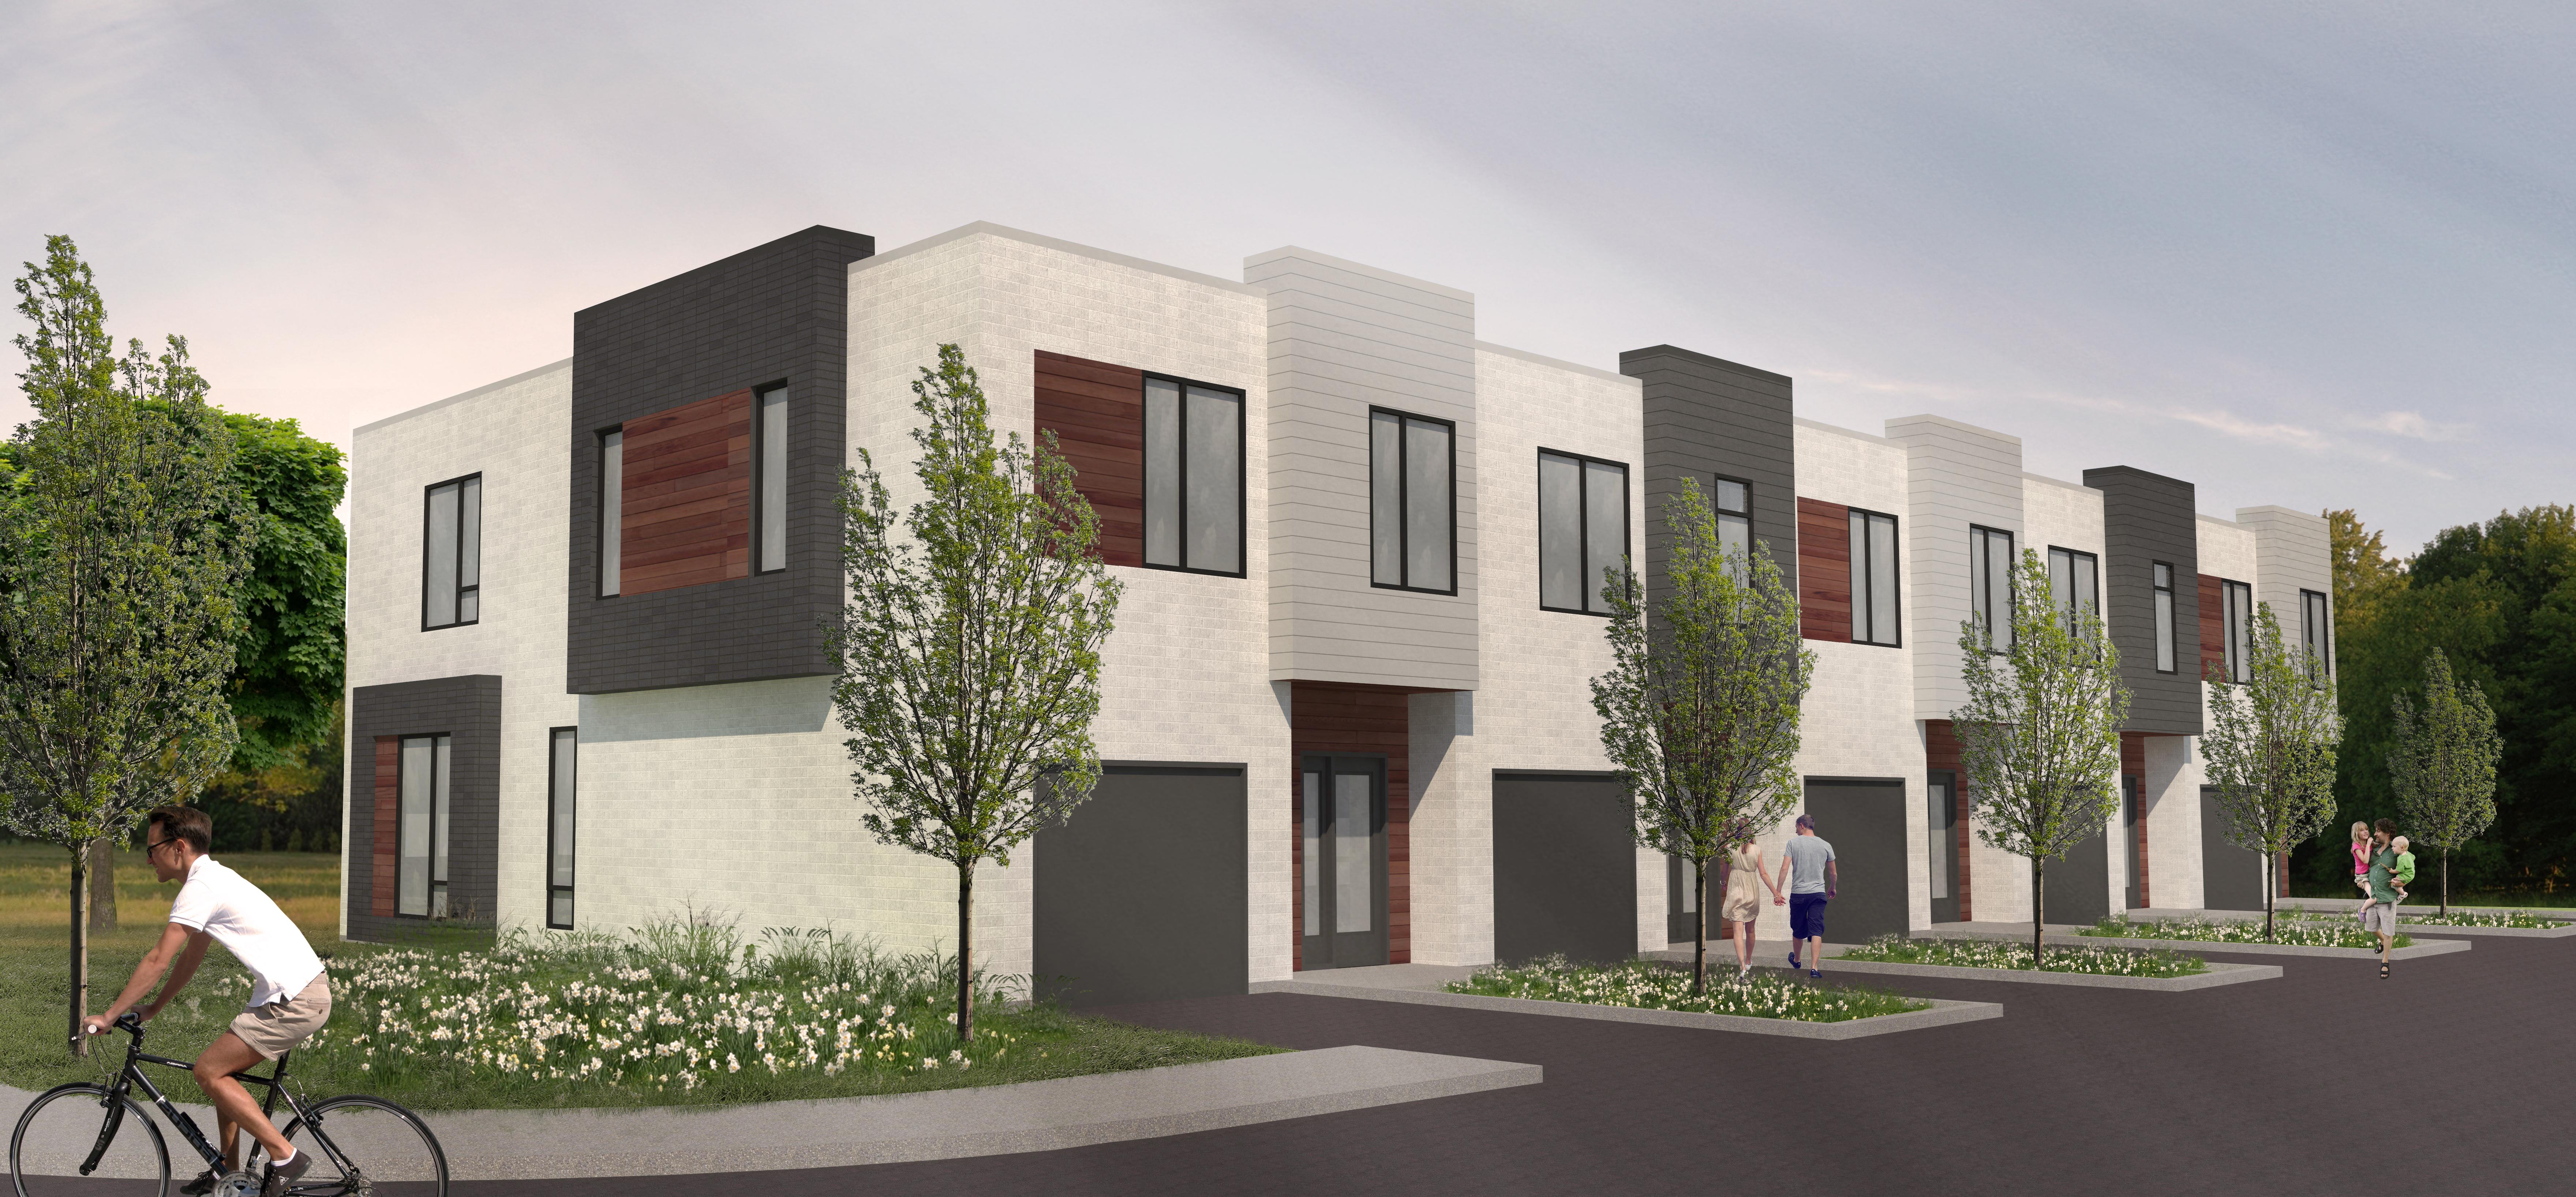 Facade Urbanova projet immobilier construction neuve blainville